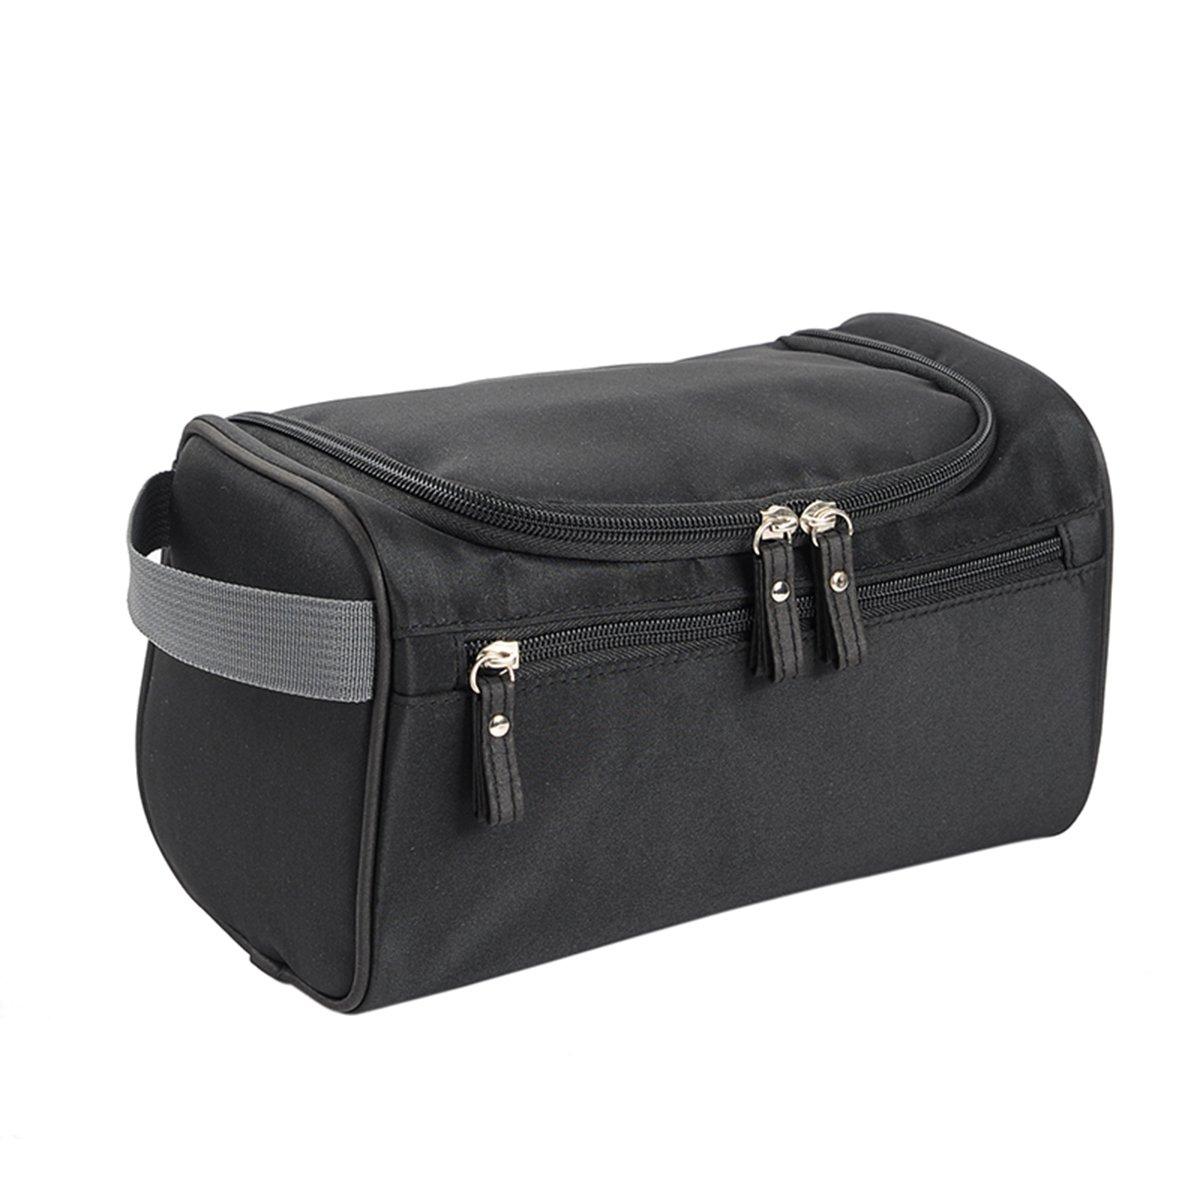 bad01b96a6 Hanging Toiletry Bag   Makeup Organizer   Cosmetic Bag   Portable Travel  Kit Organizer   Household